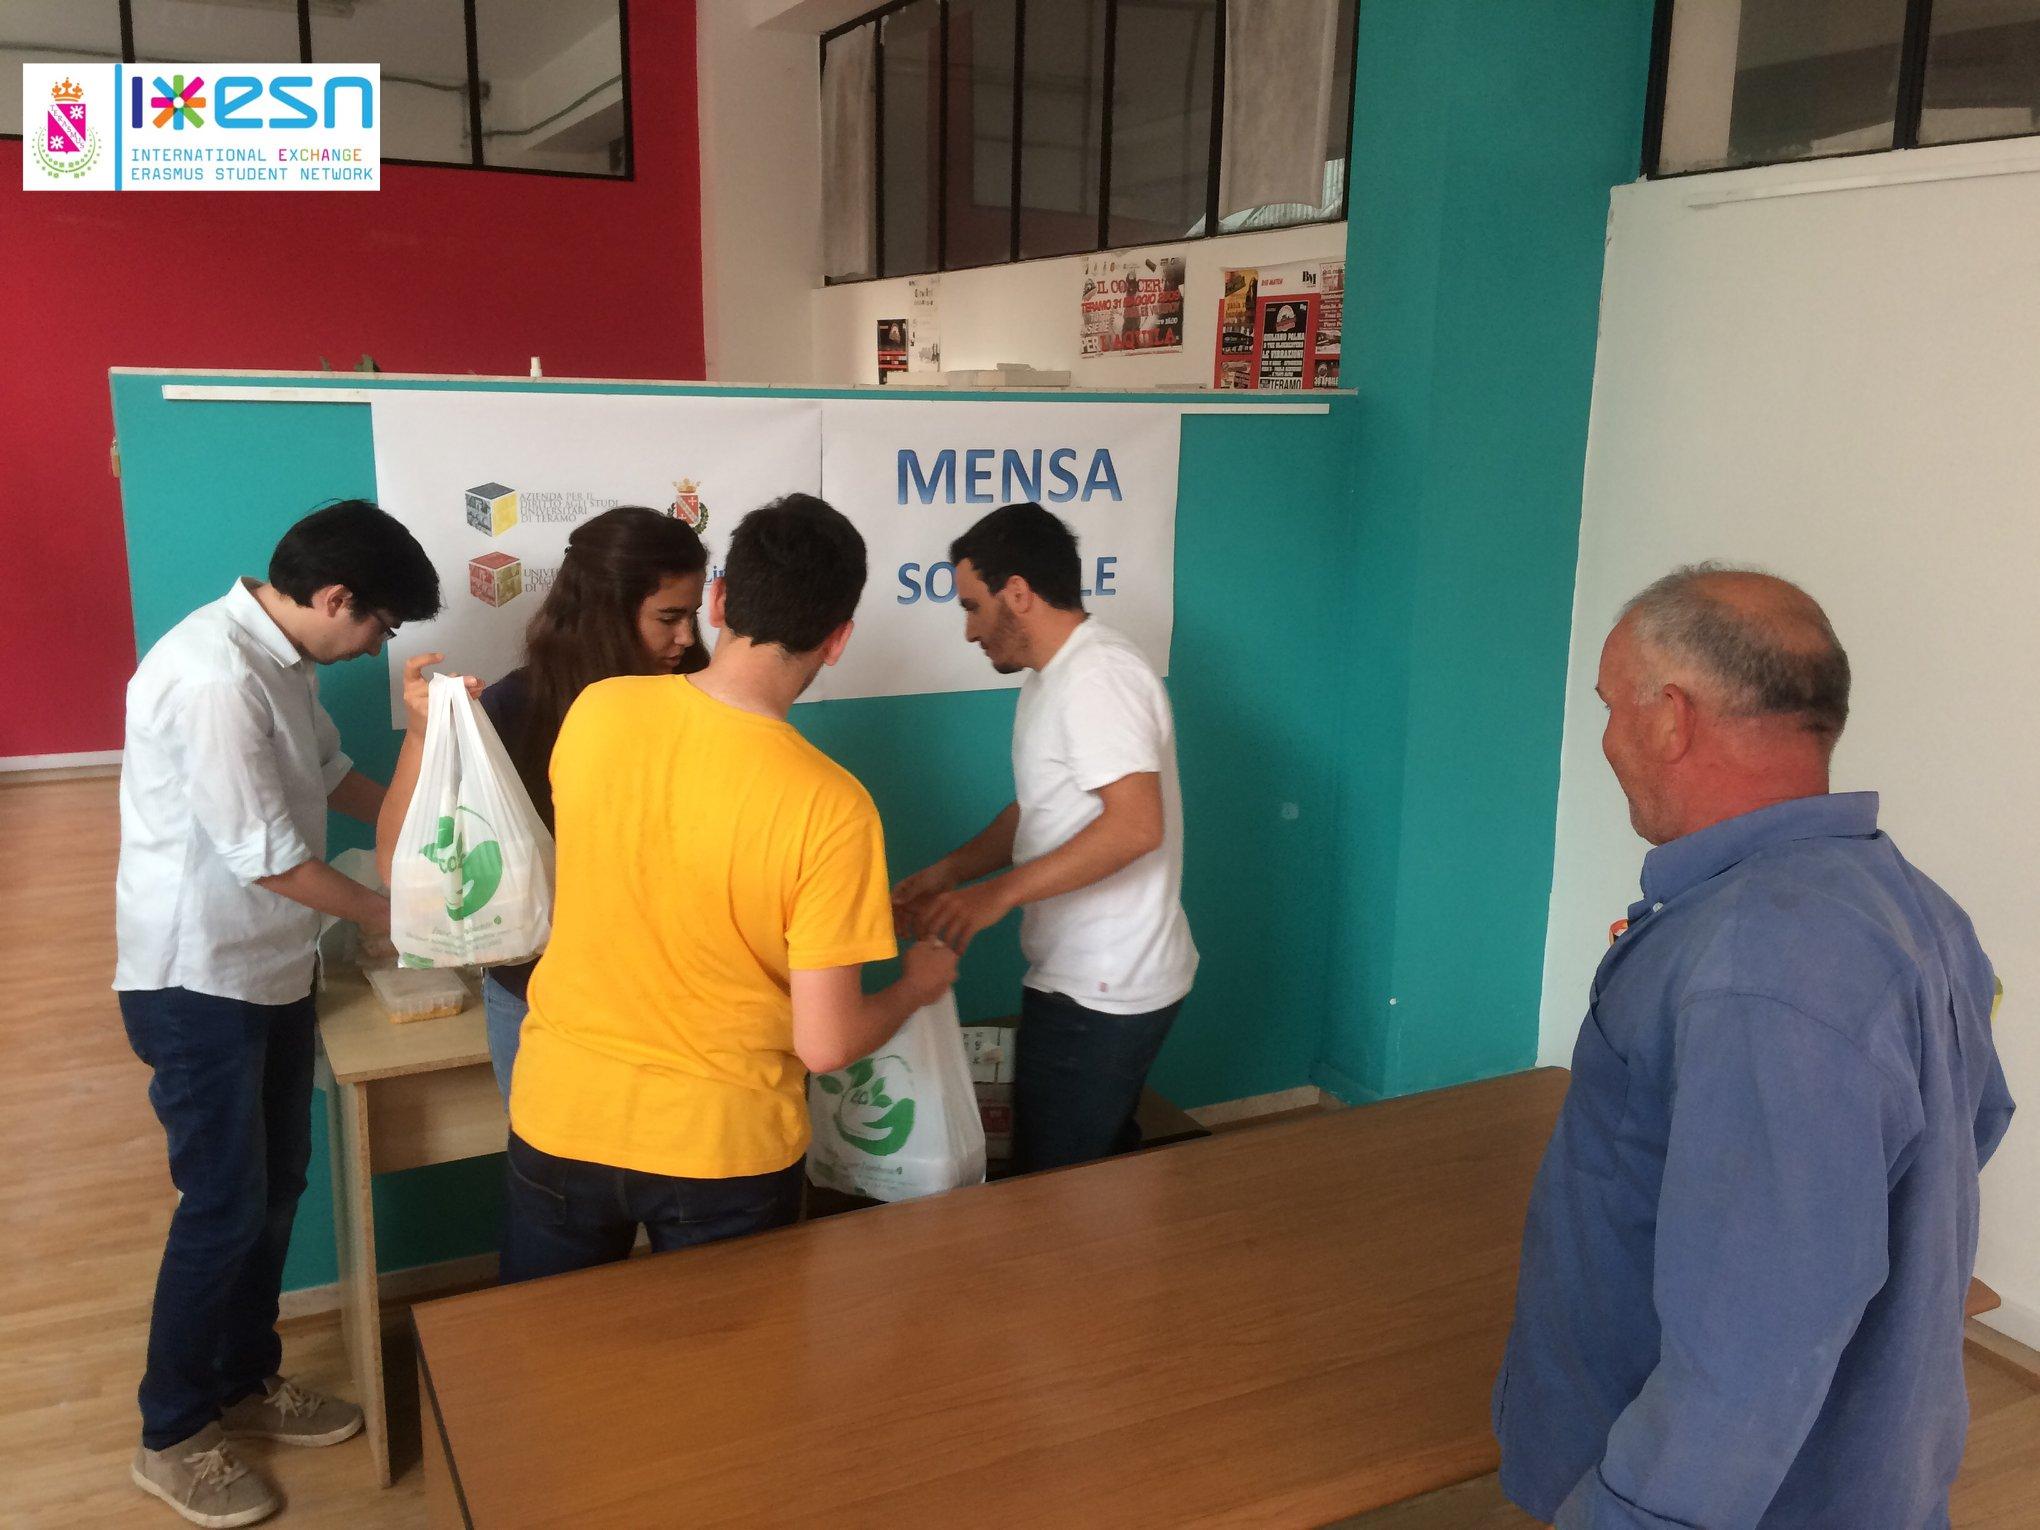 ESN Teramo - Erasmus Student Network - Mensa Solidale